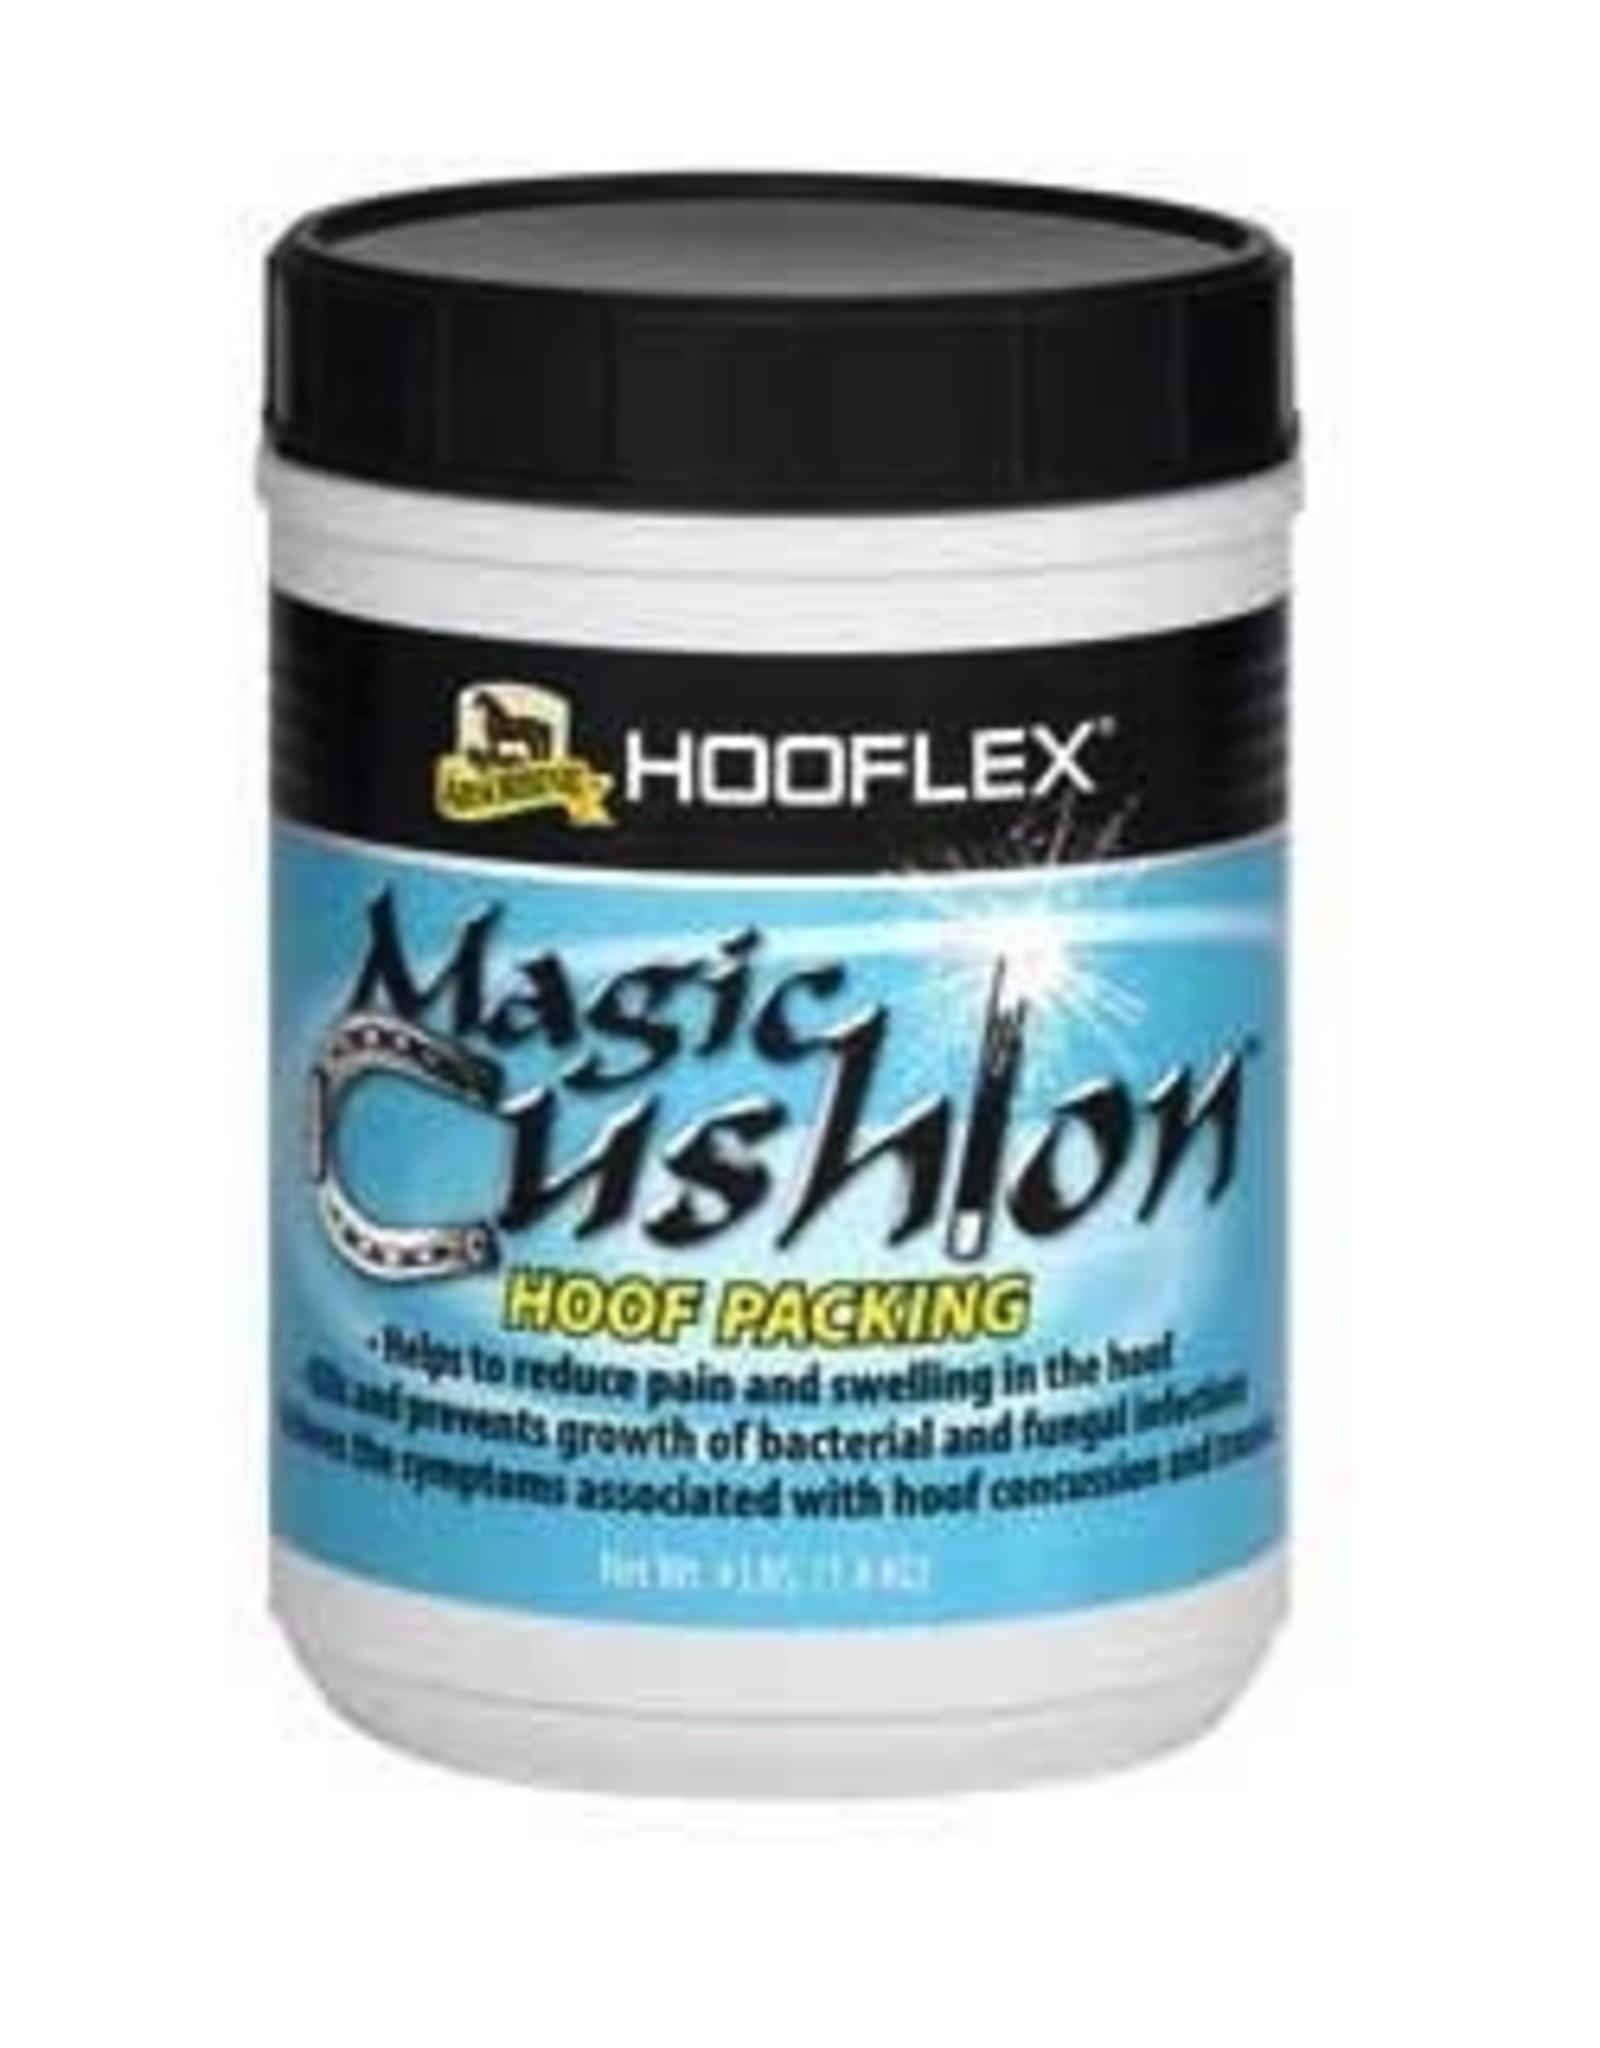 Hooflex Magic Cushion Hoof Packing - 4lbs